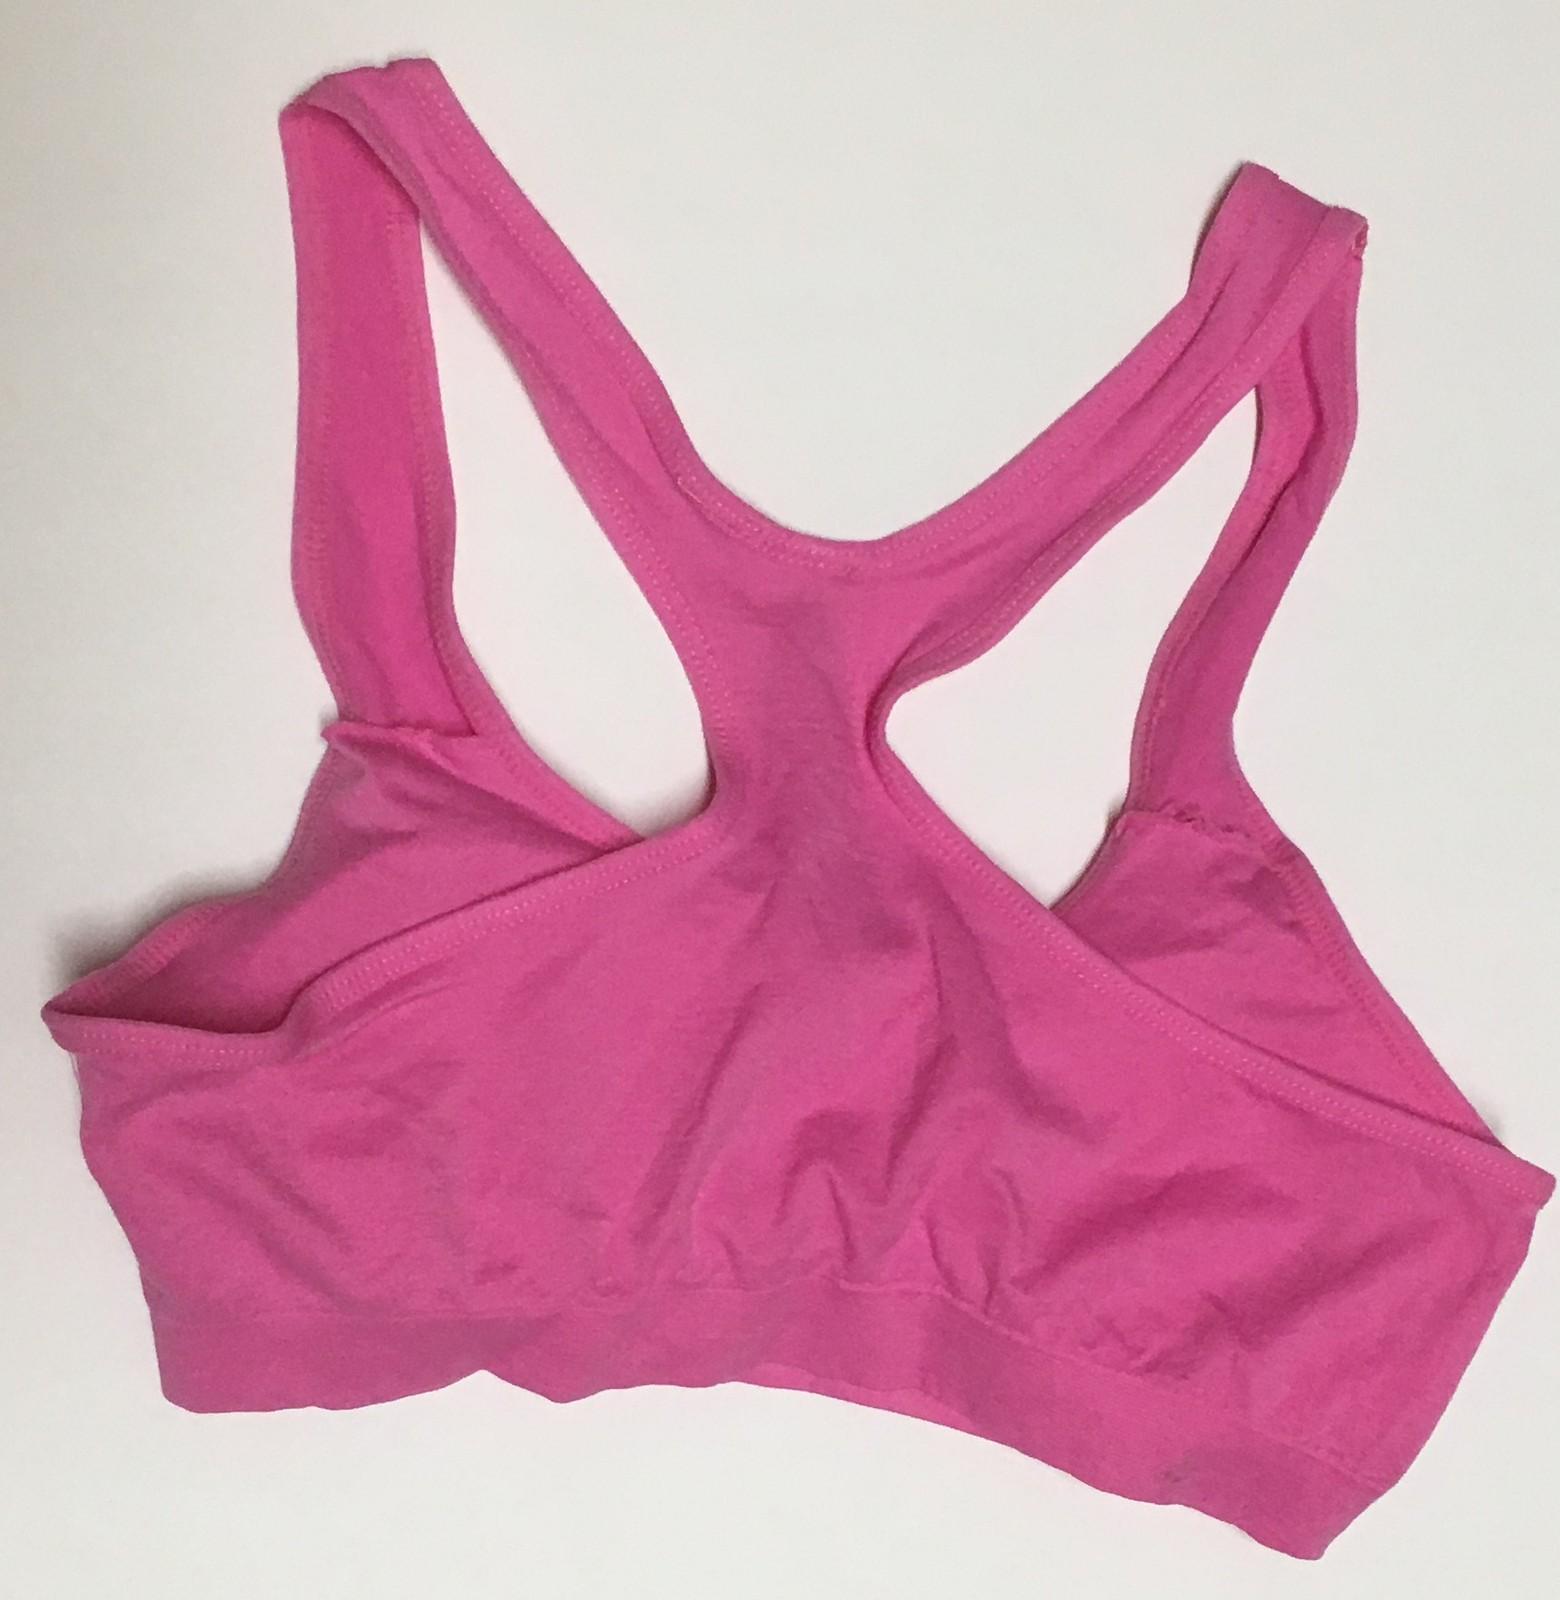 Women's Sport Support Bra Light Pink SZ Medium Light Padding image 3